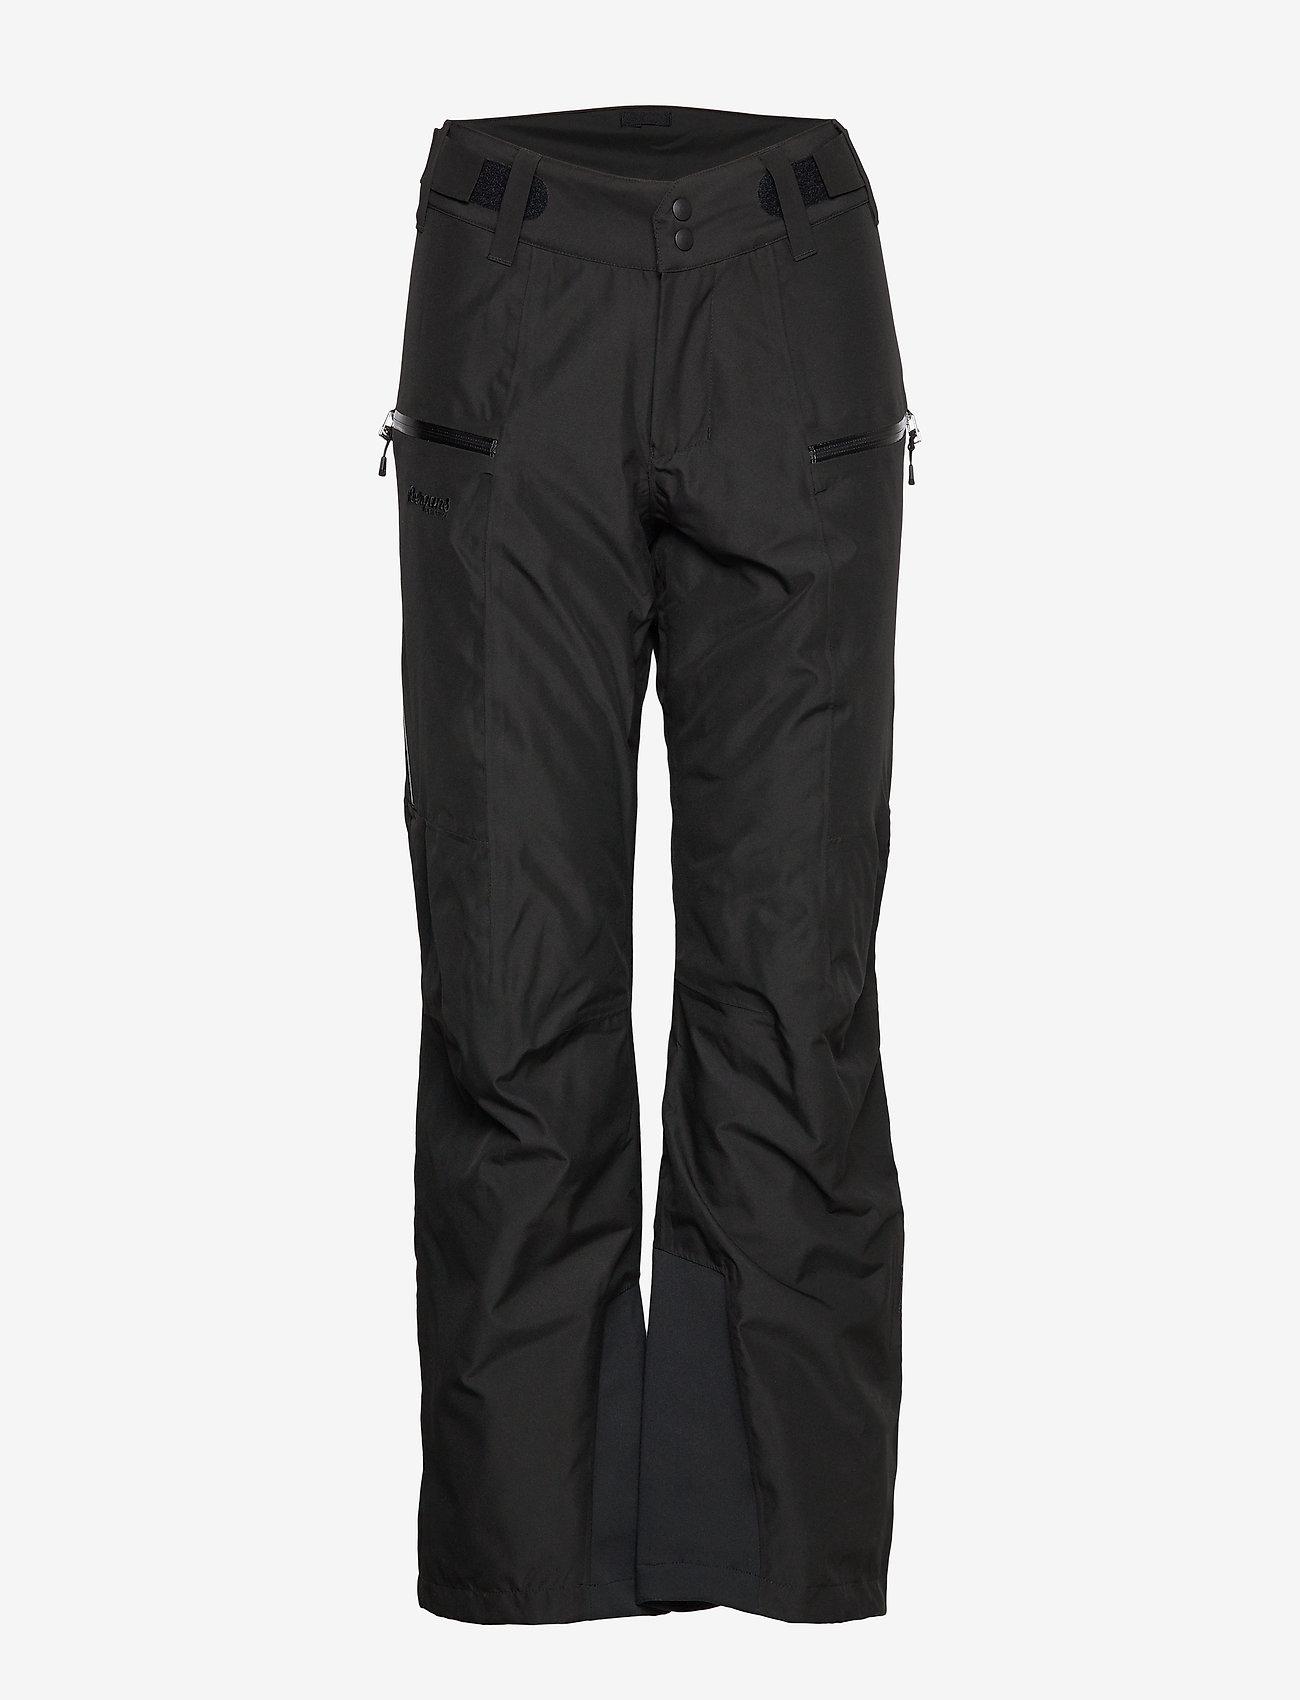 Bergans - Stranda Ins W Pnt - insulated pants - black/solidcharcoal - 0